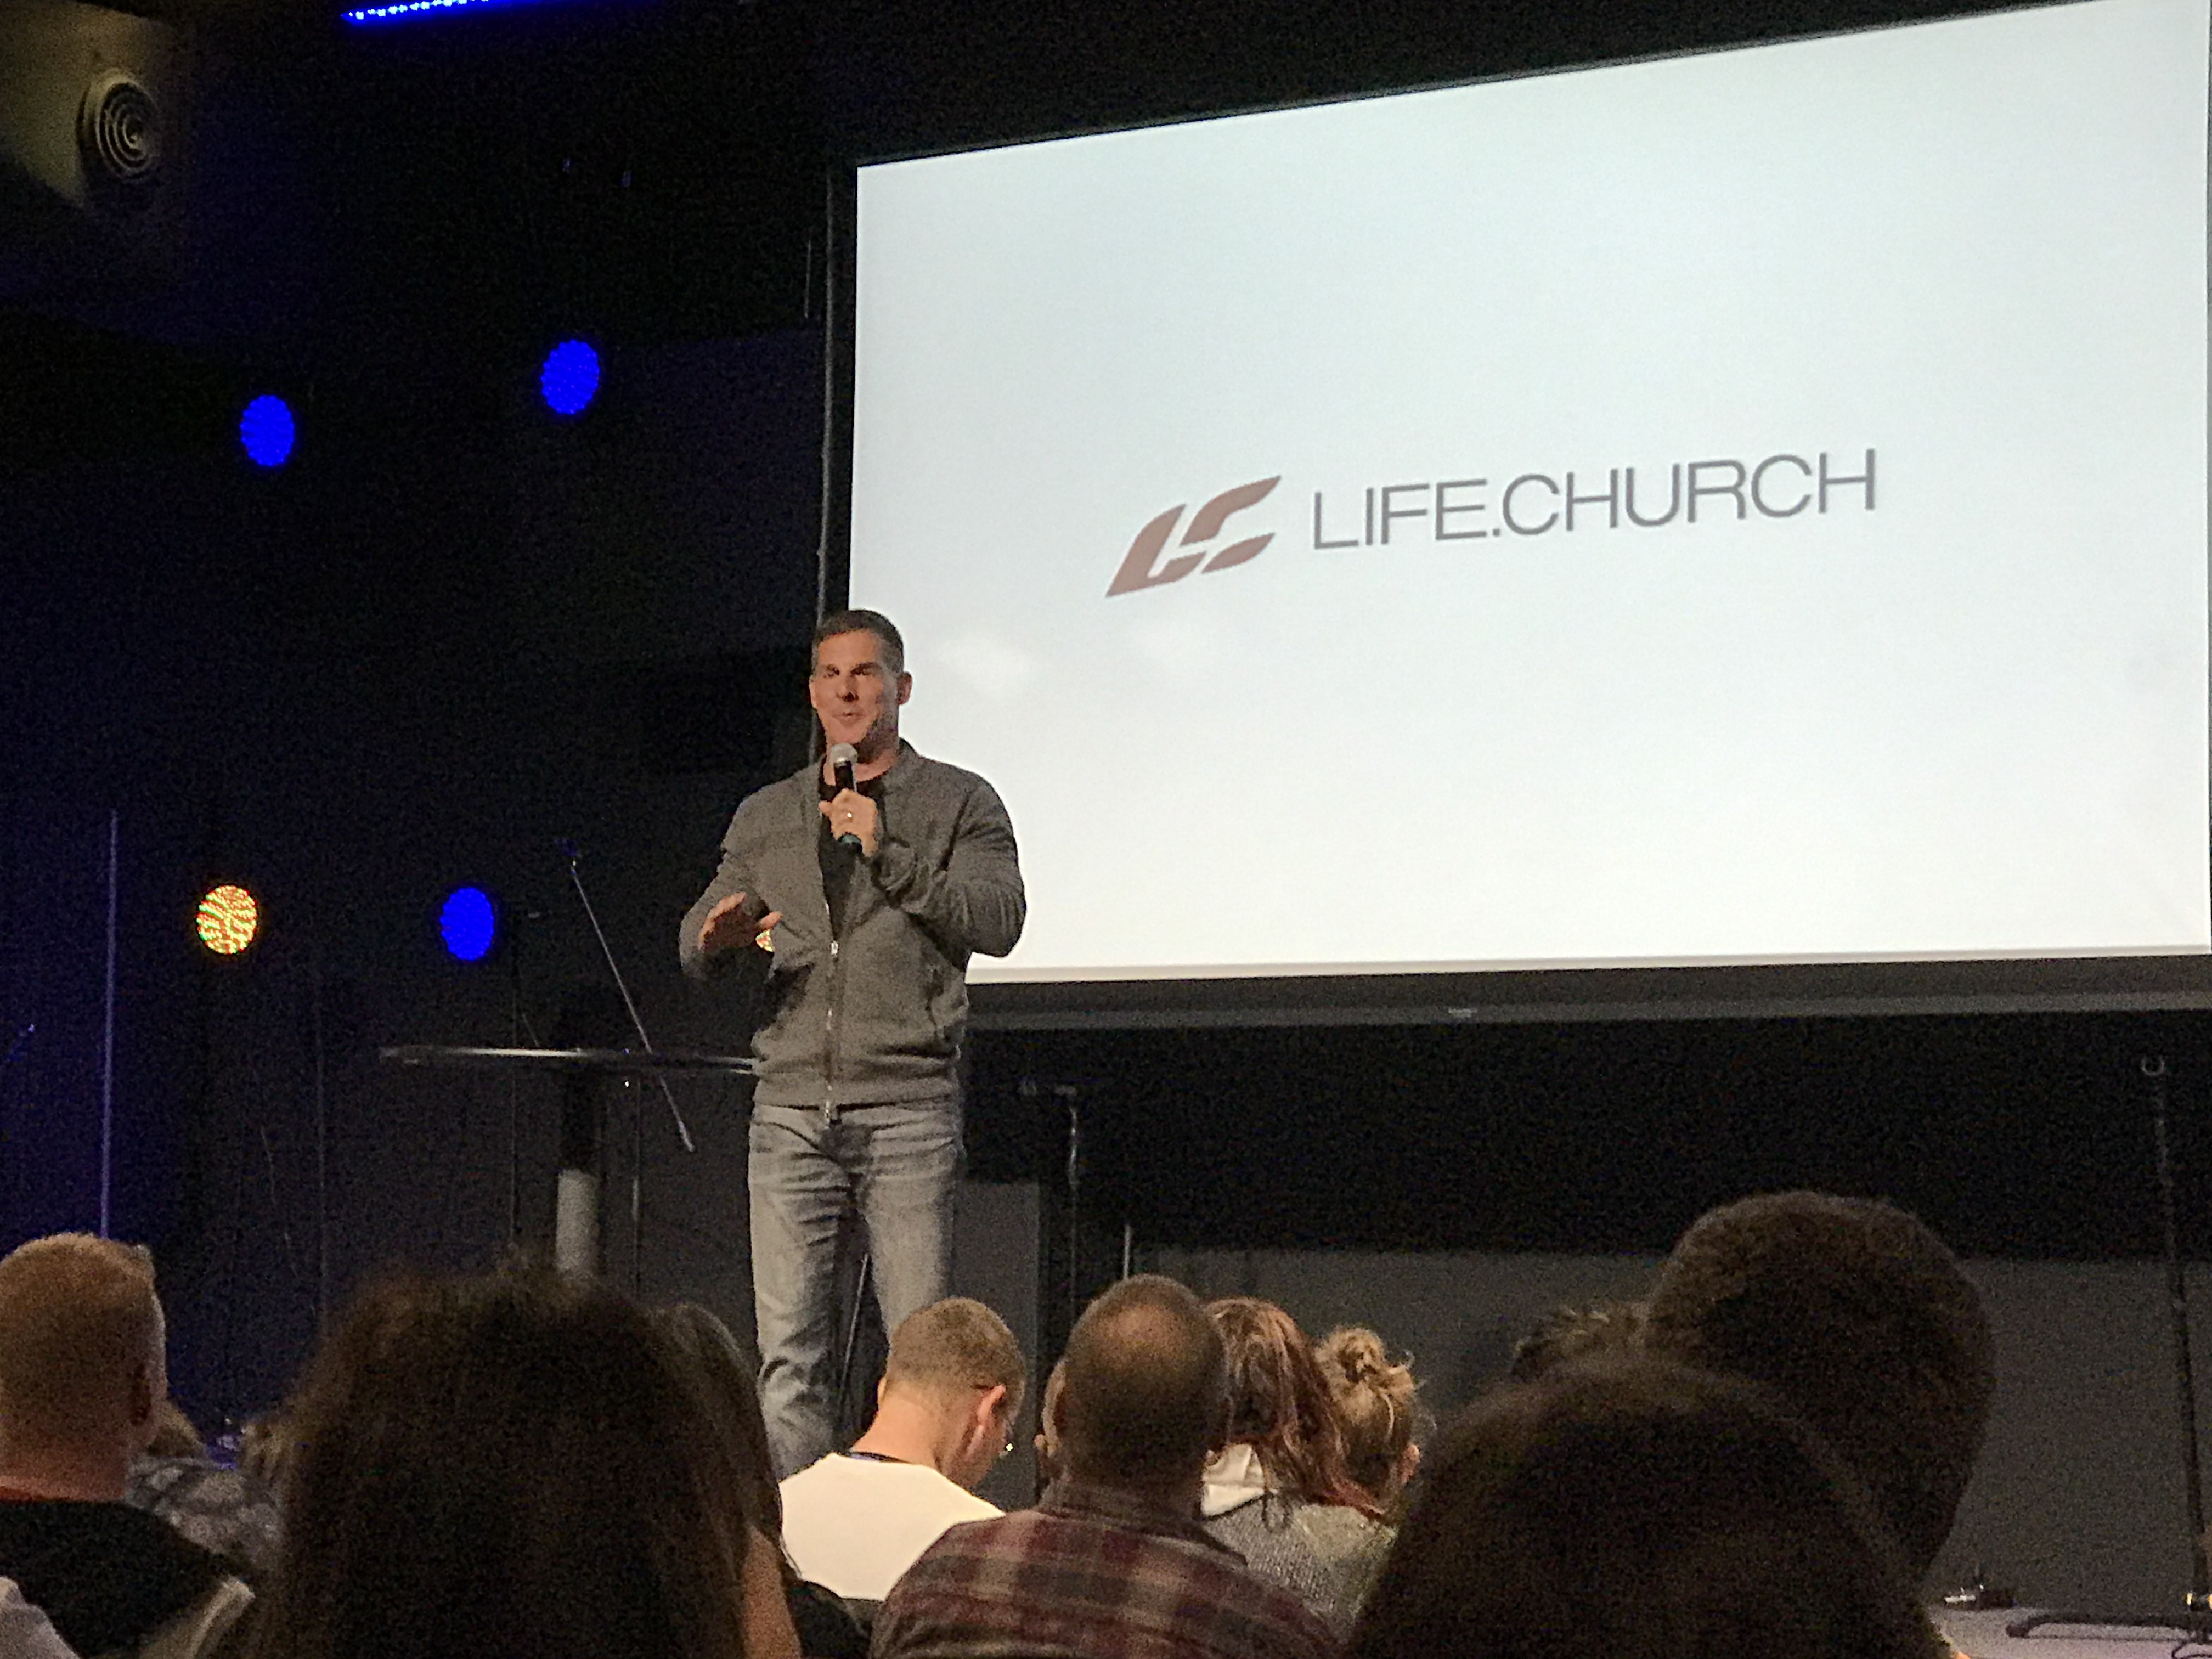 Life.Church senior pastor Craig Groeschel talks with the congregation before TheBod.church Fort Smith votes to become Life.Church Fort Smith